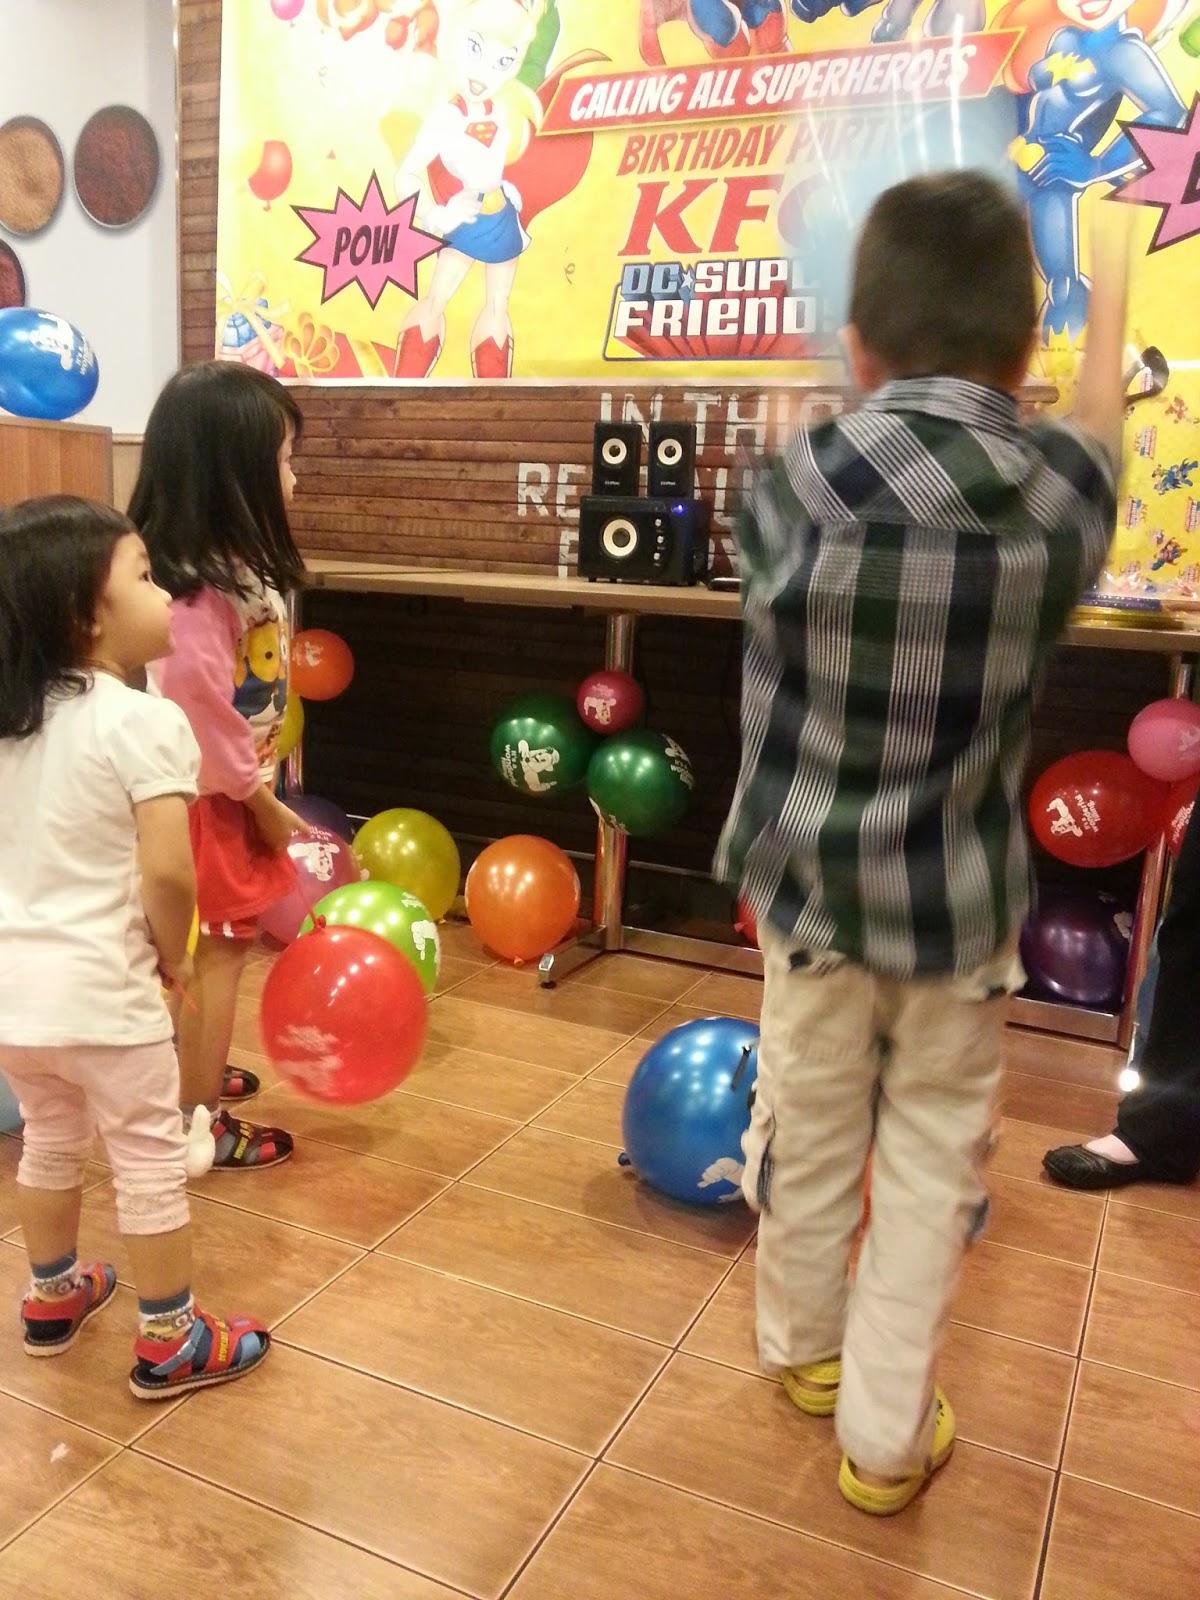 My girls Birthday Party @ KFC Aeon Big, Wangsa Maju ...